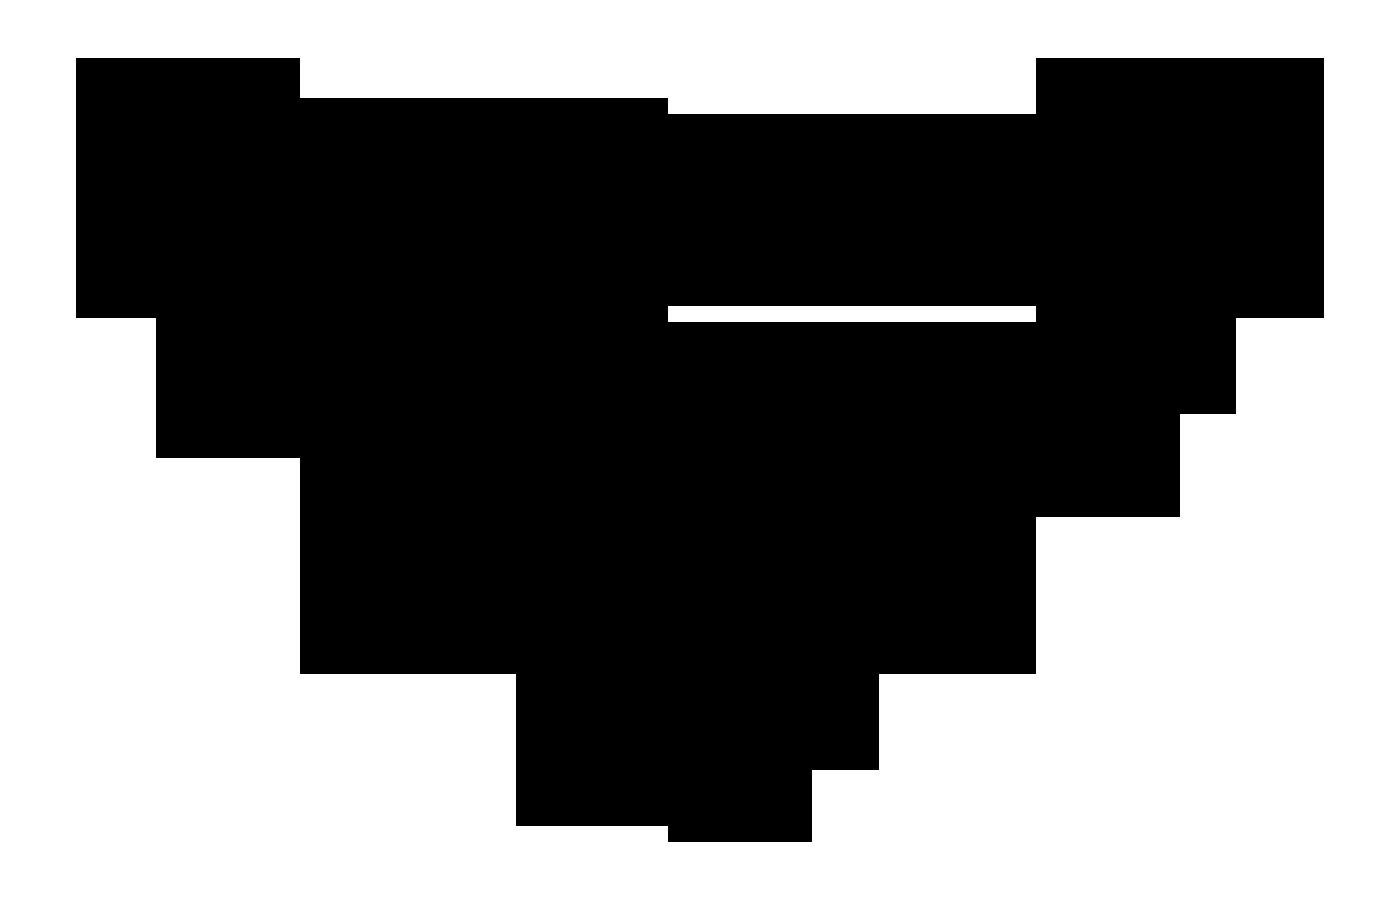 Roxy logo histoire et signification, evolution, symbole Roxy